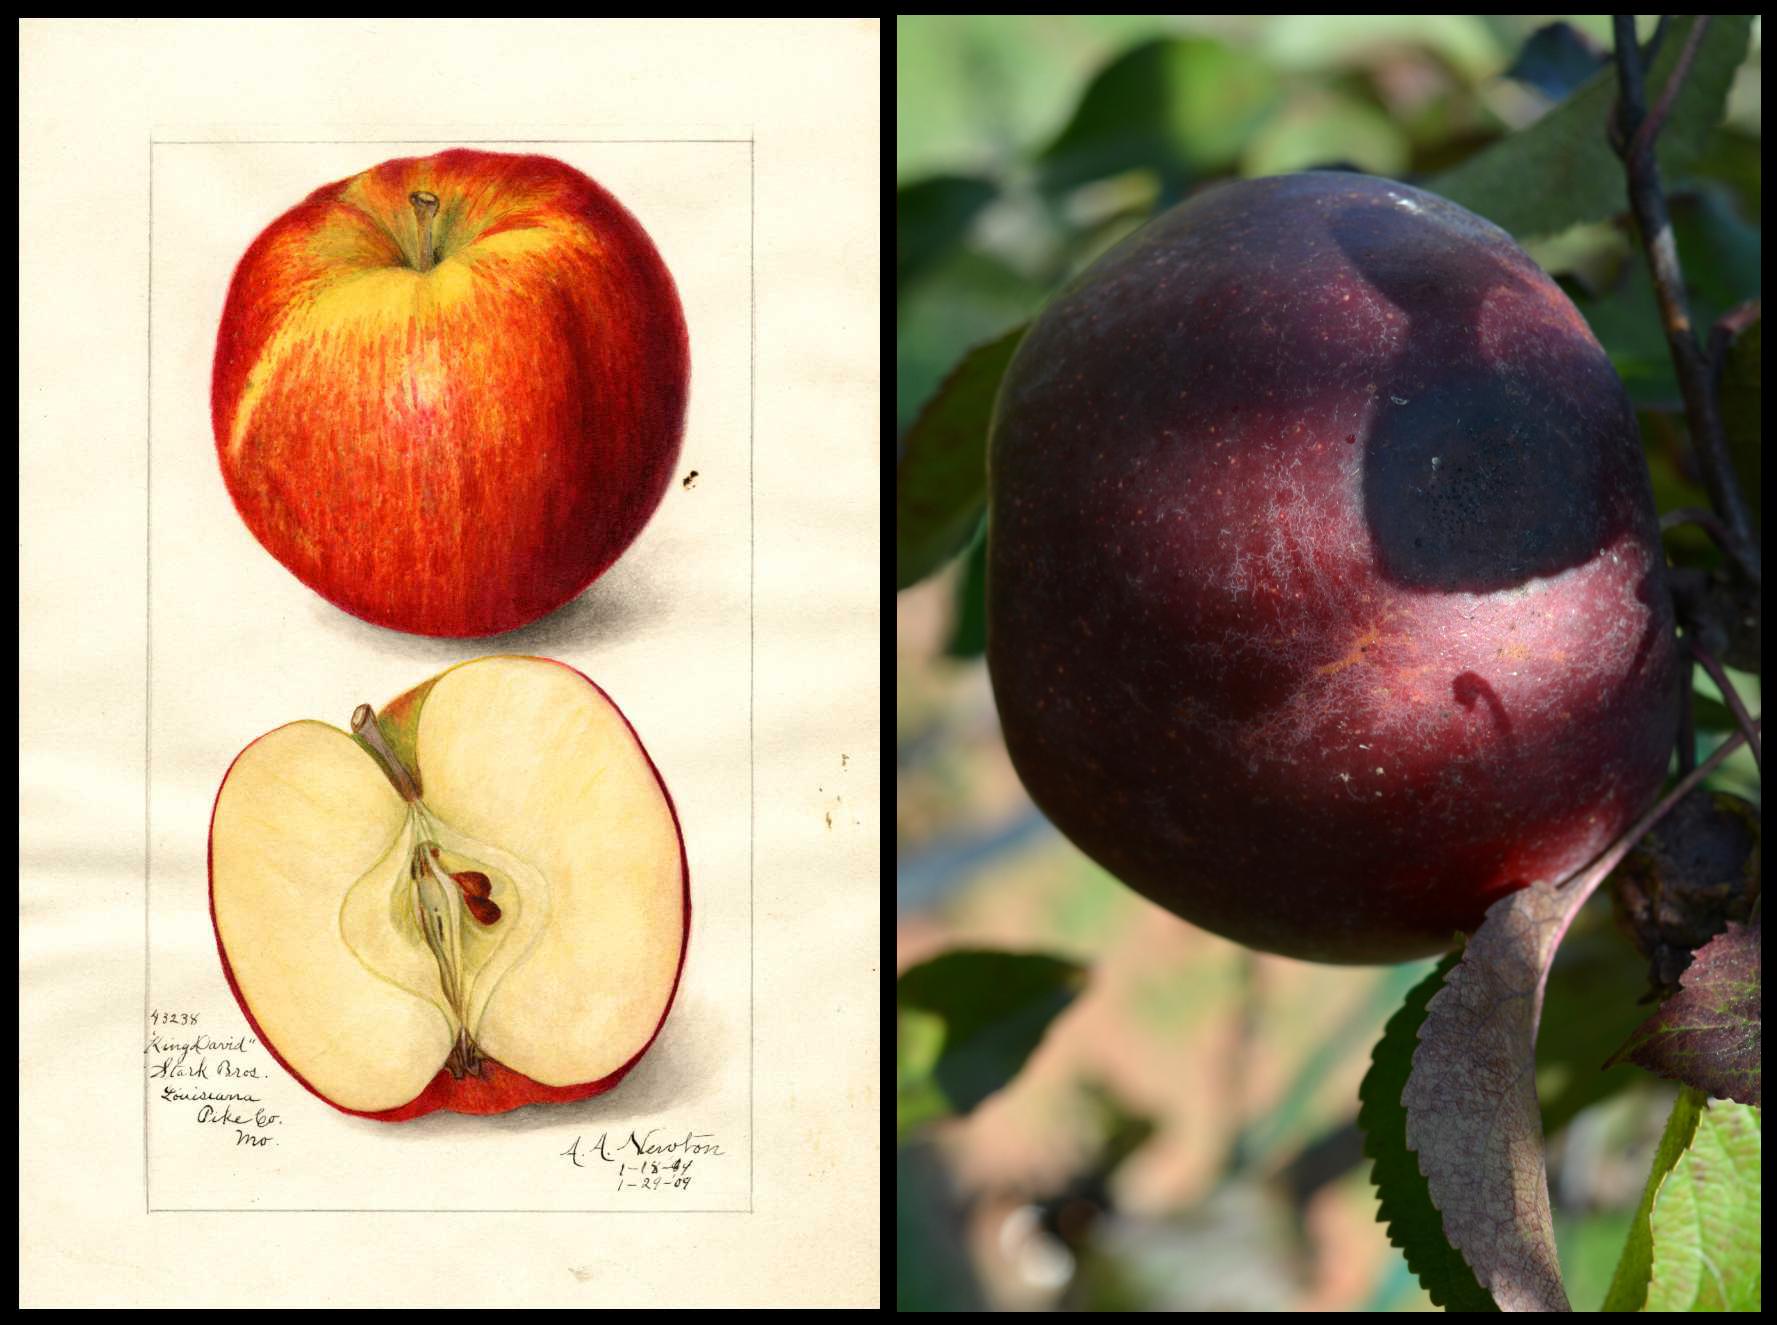 dark red, almost purple, apple